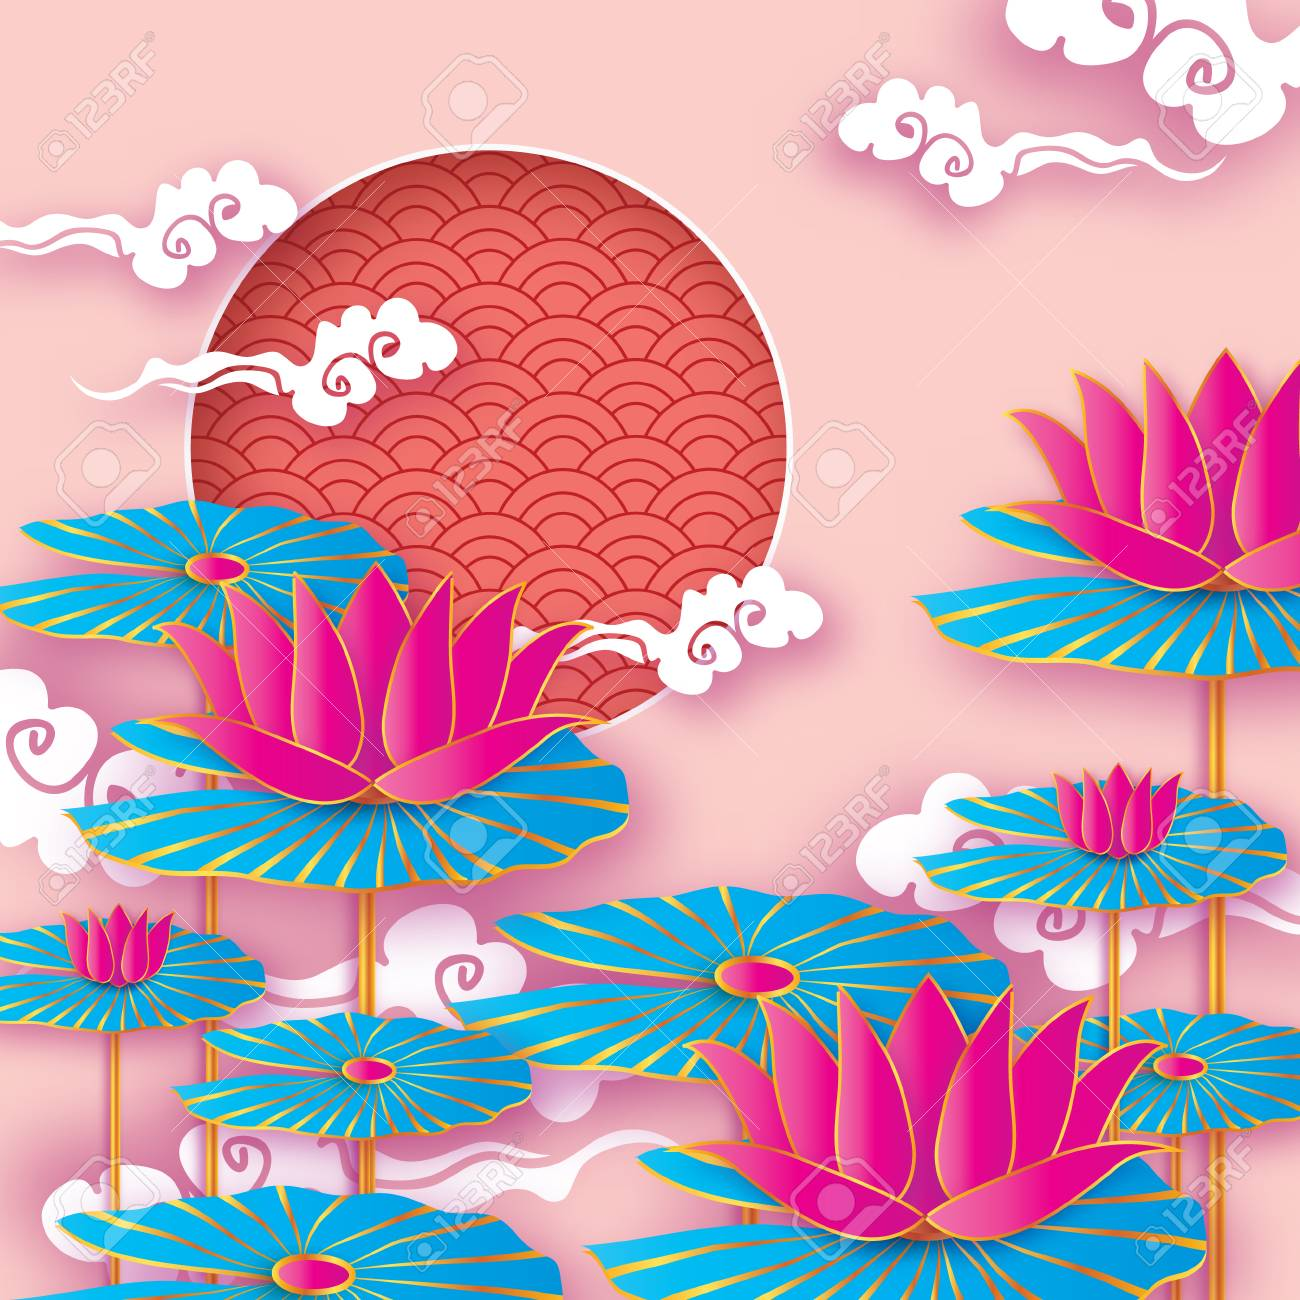 Beau Nenuphar Origami Ou Fleur De Lotus Bonne Annee Chinoise Du